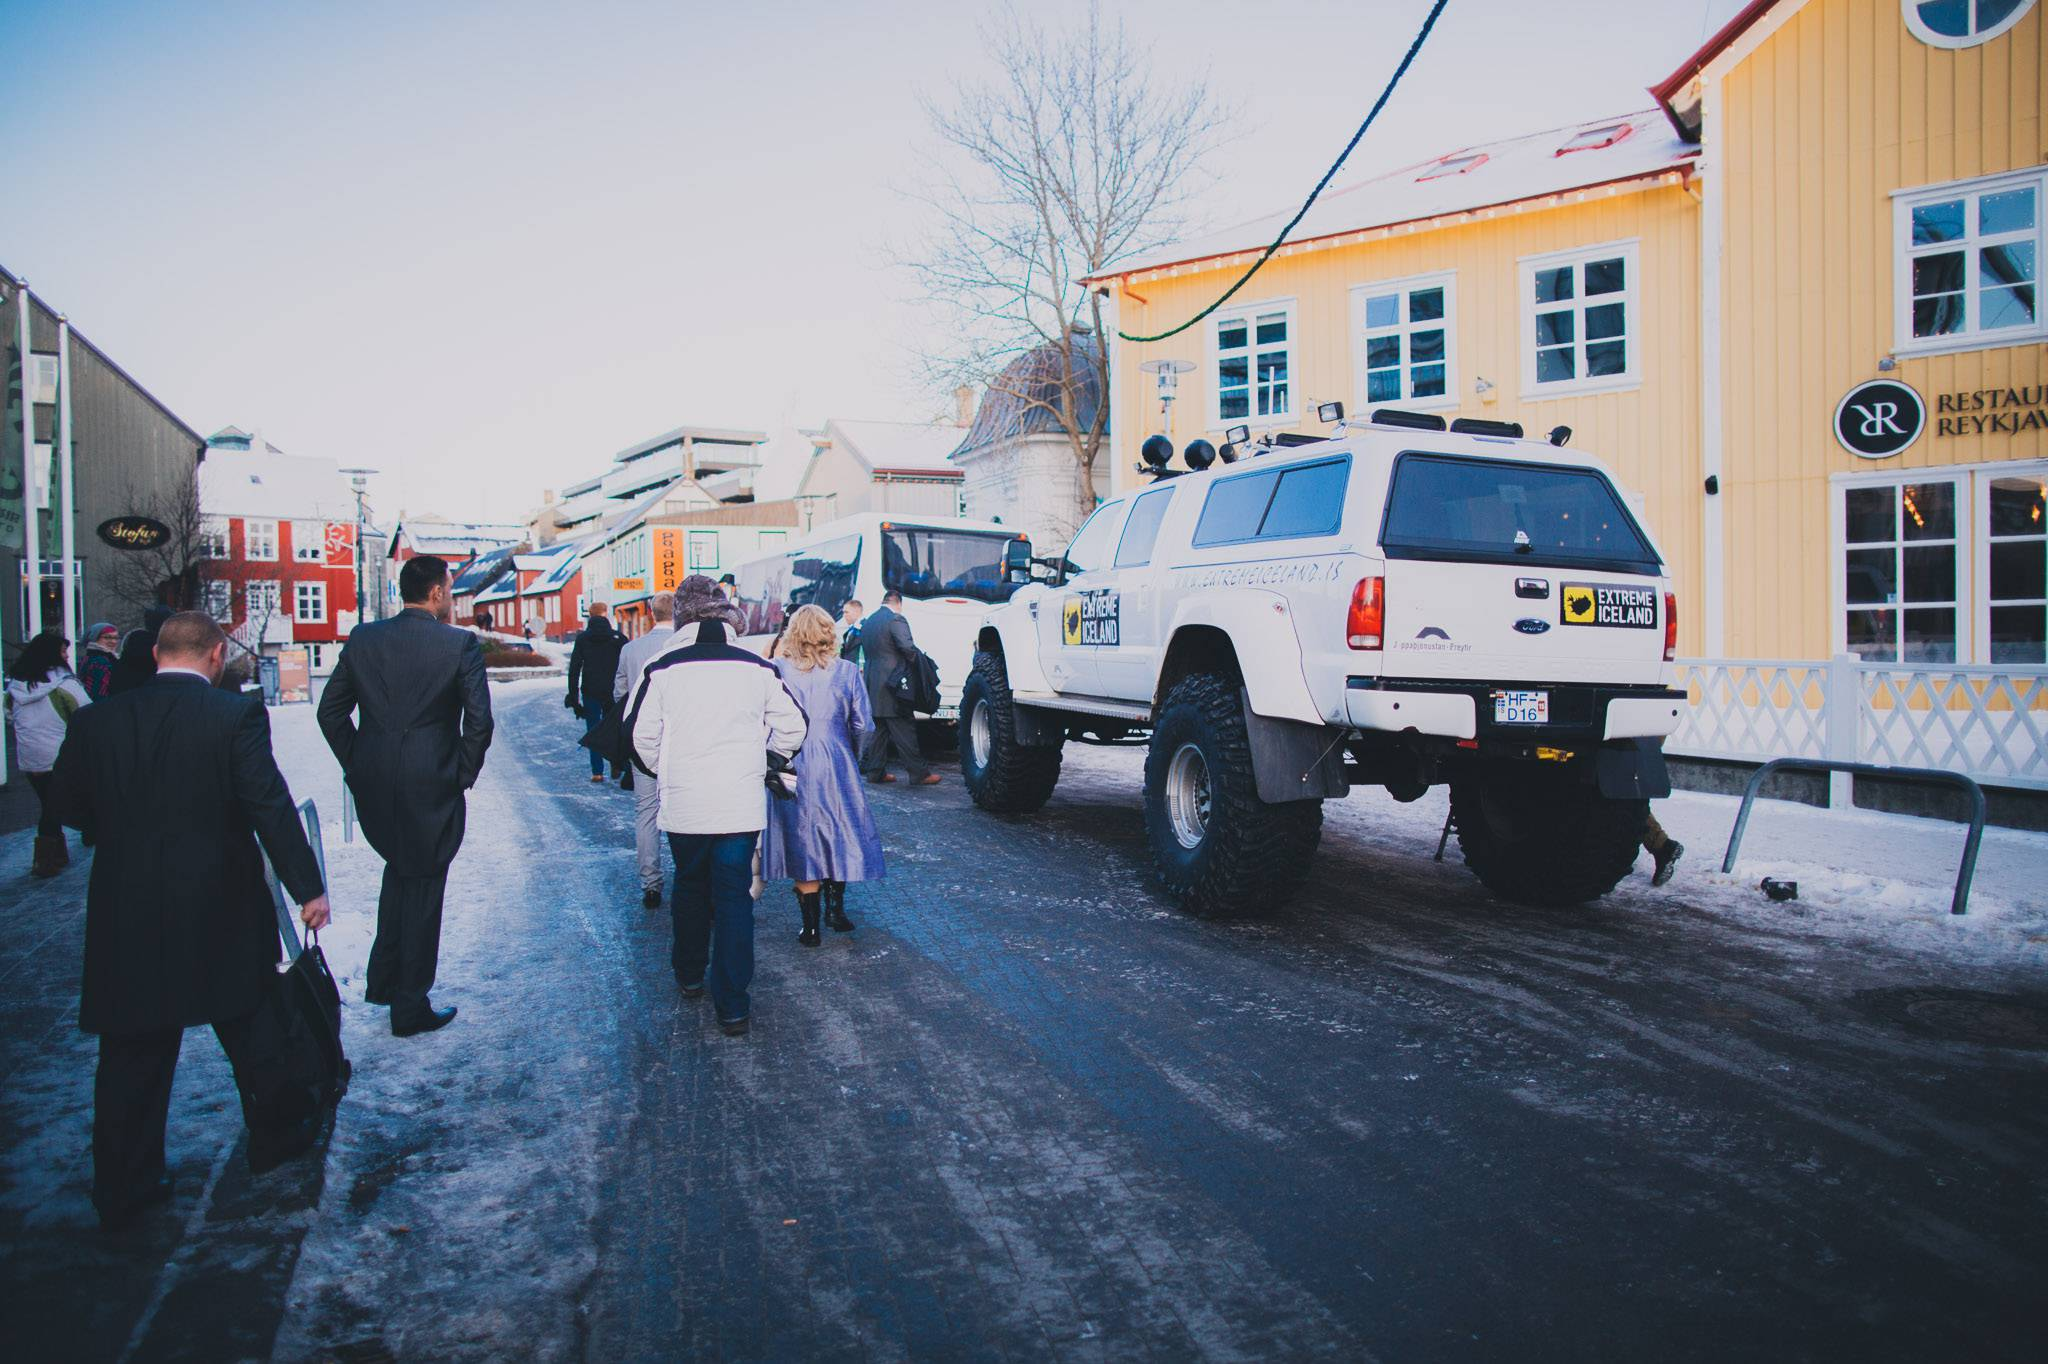 iceland-wedding-photographer 8.jpg